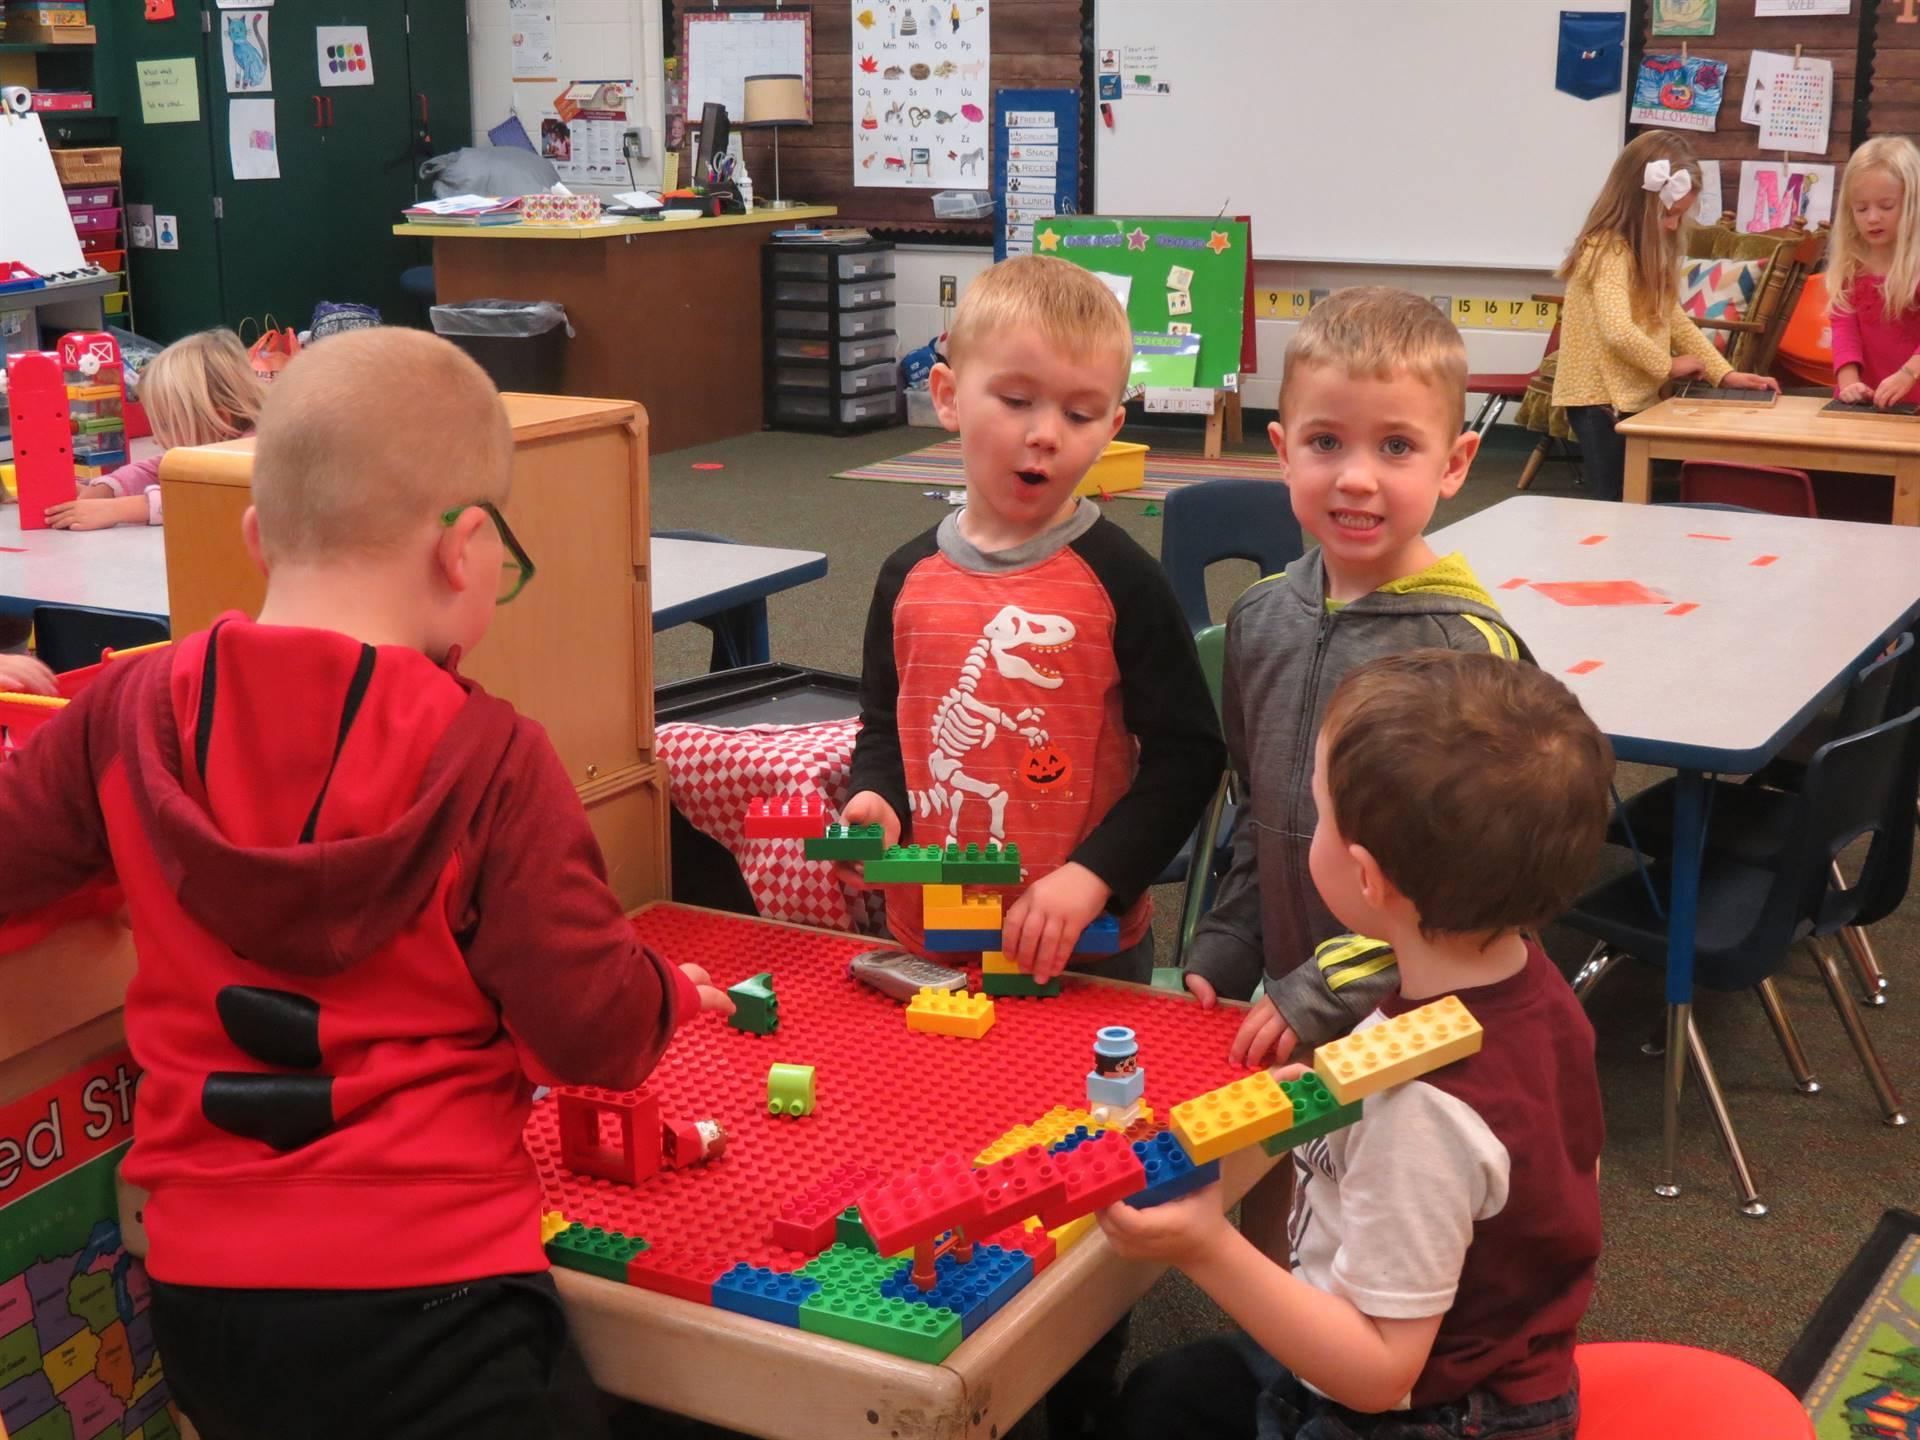 Elementary free play